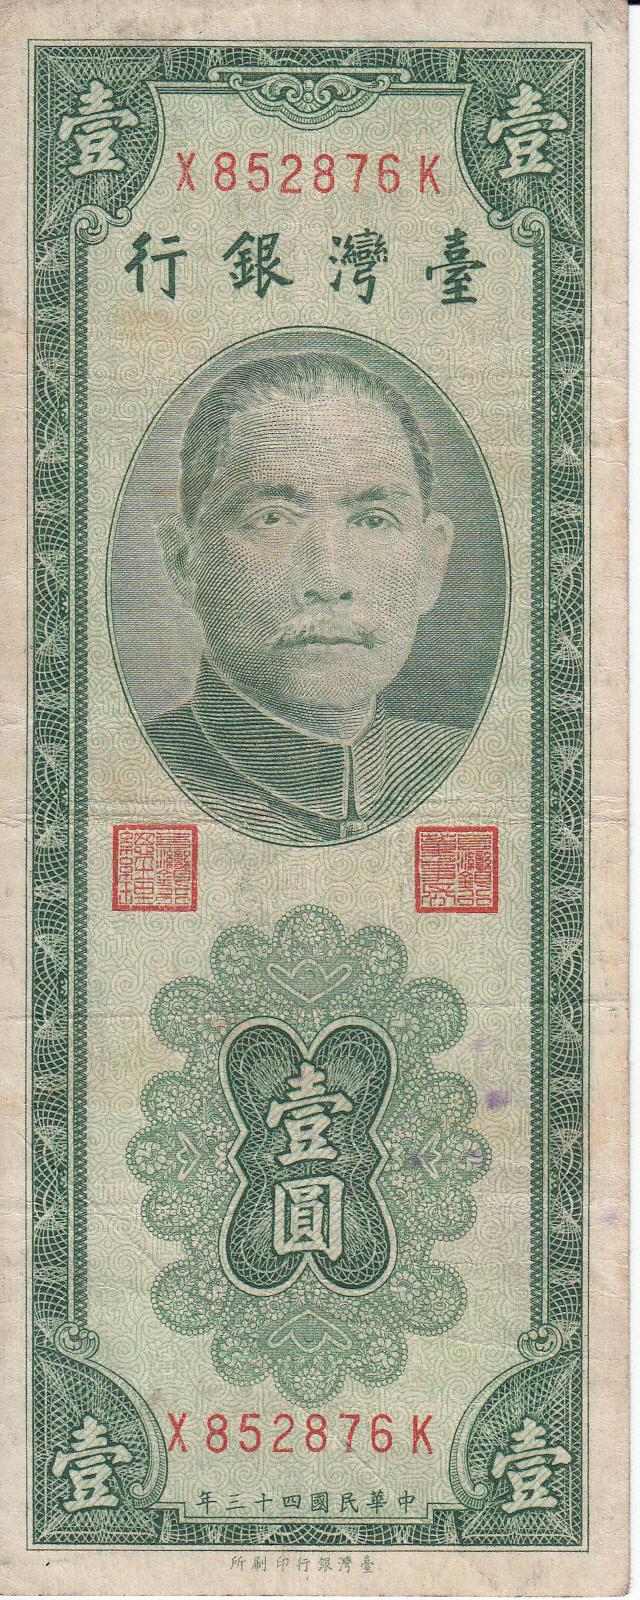 TAIWAN 1 YUAN 1954 P 1966 UNC